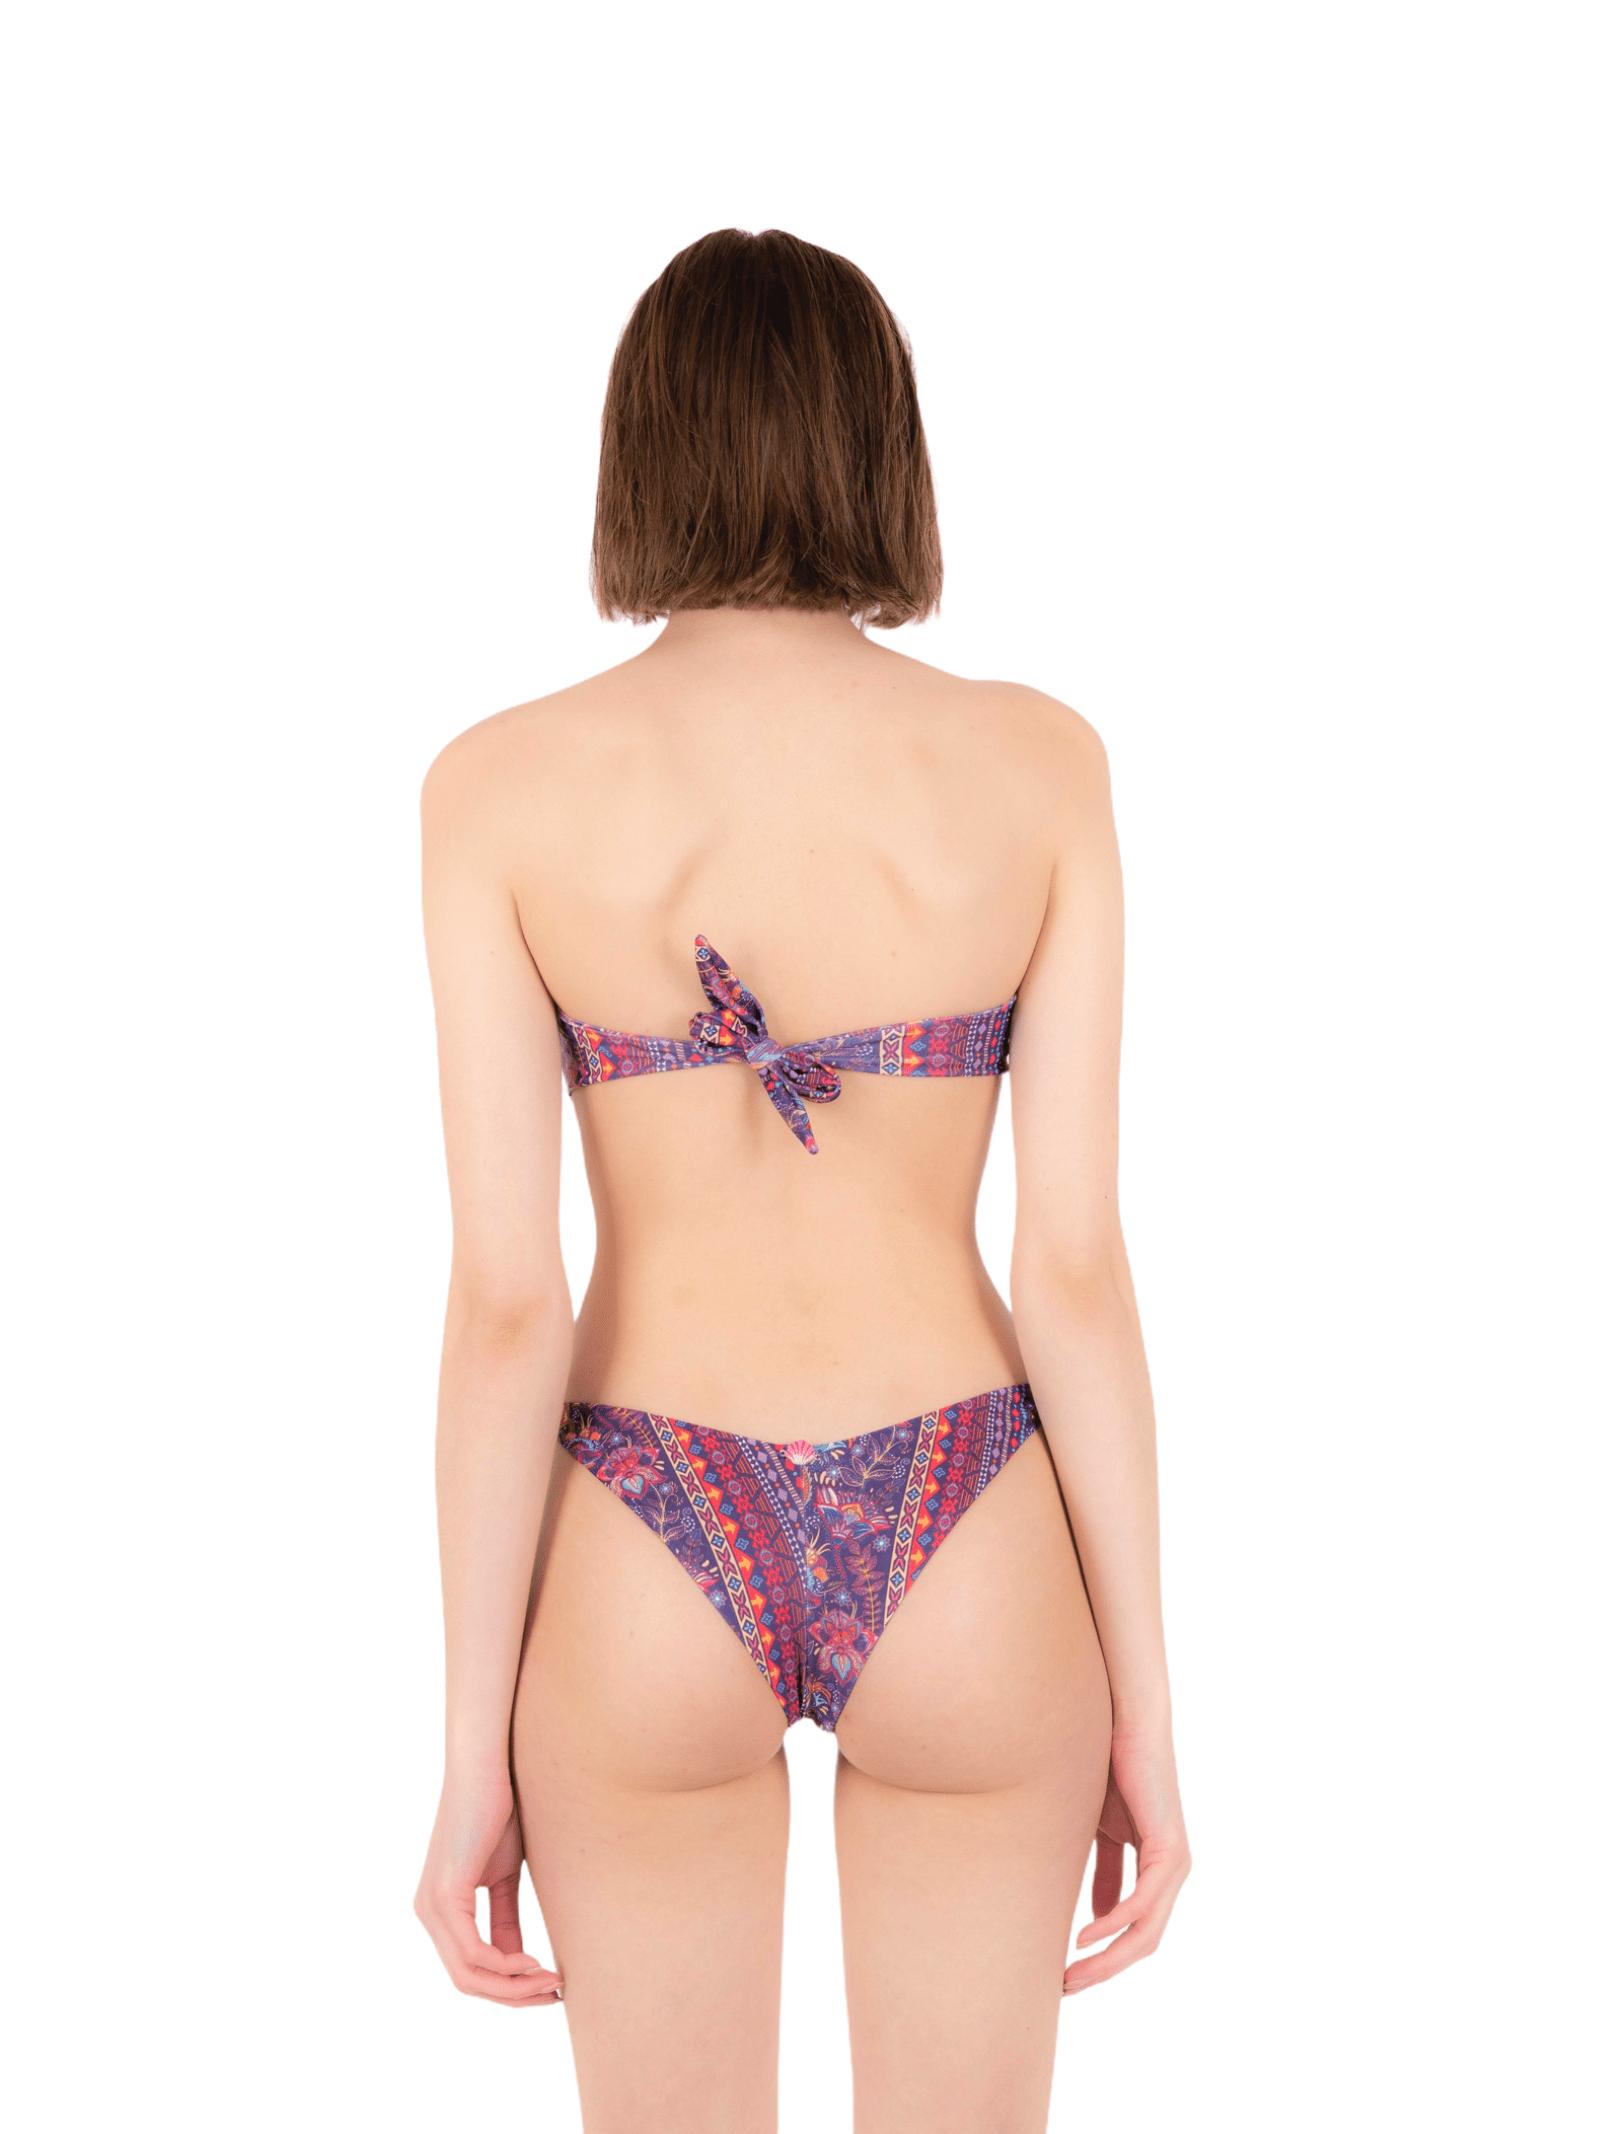 Bikini top with bow slip ANNAMARE   23   BK-116ROSA